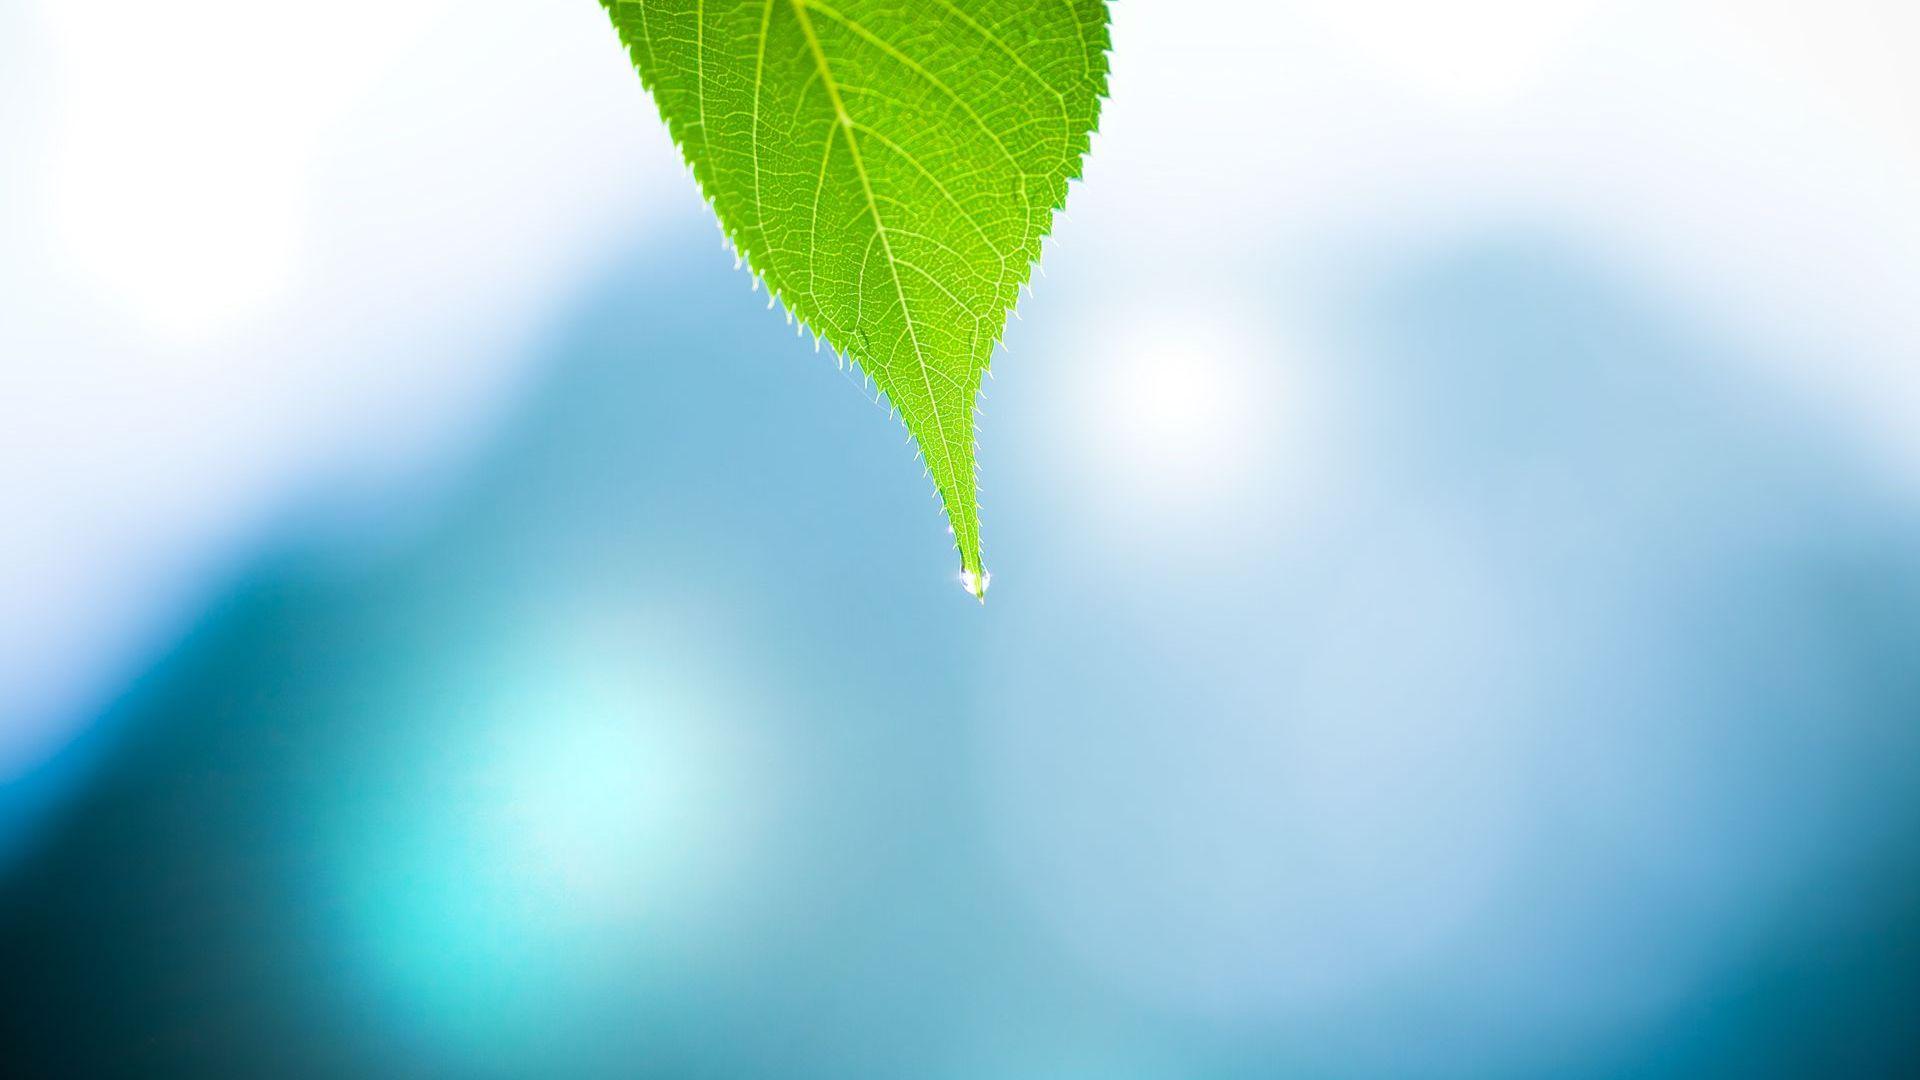 Autumn Leaves 3d Live Wallpaper Leaf Wallpaper Dew Drops Hd Desktop Wallpapers 4k Hd